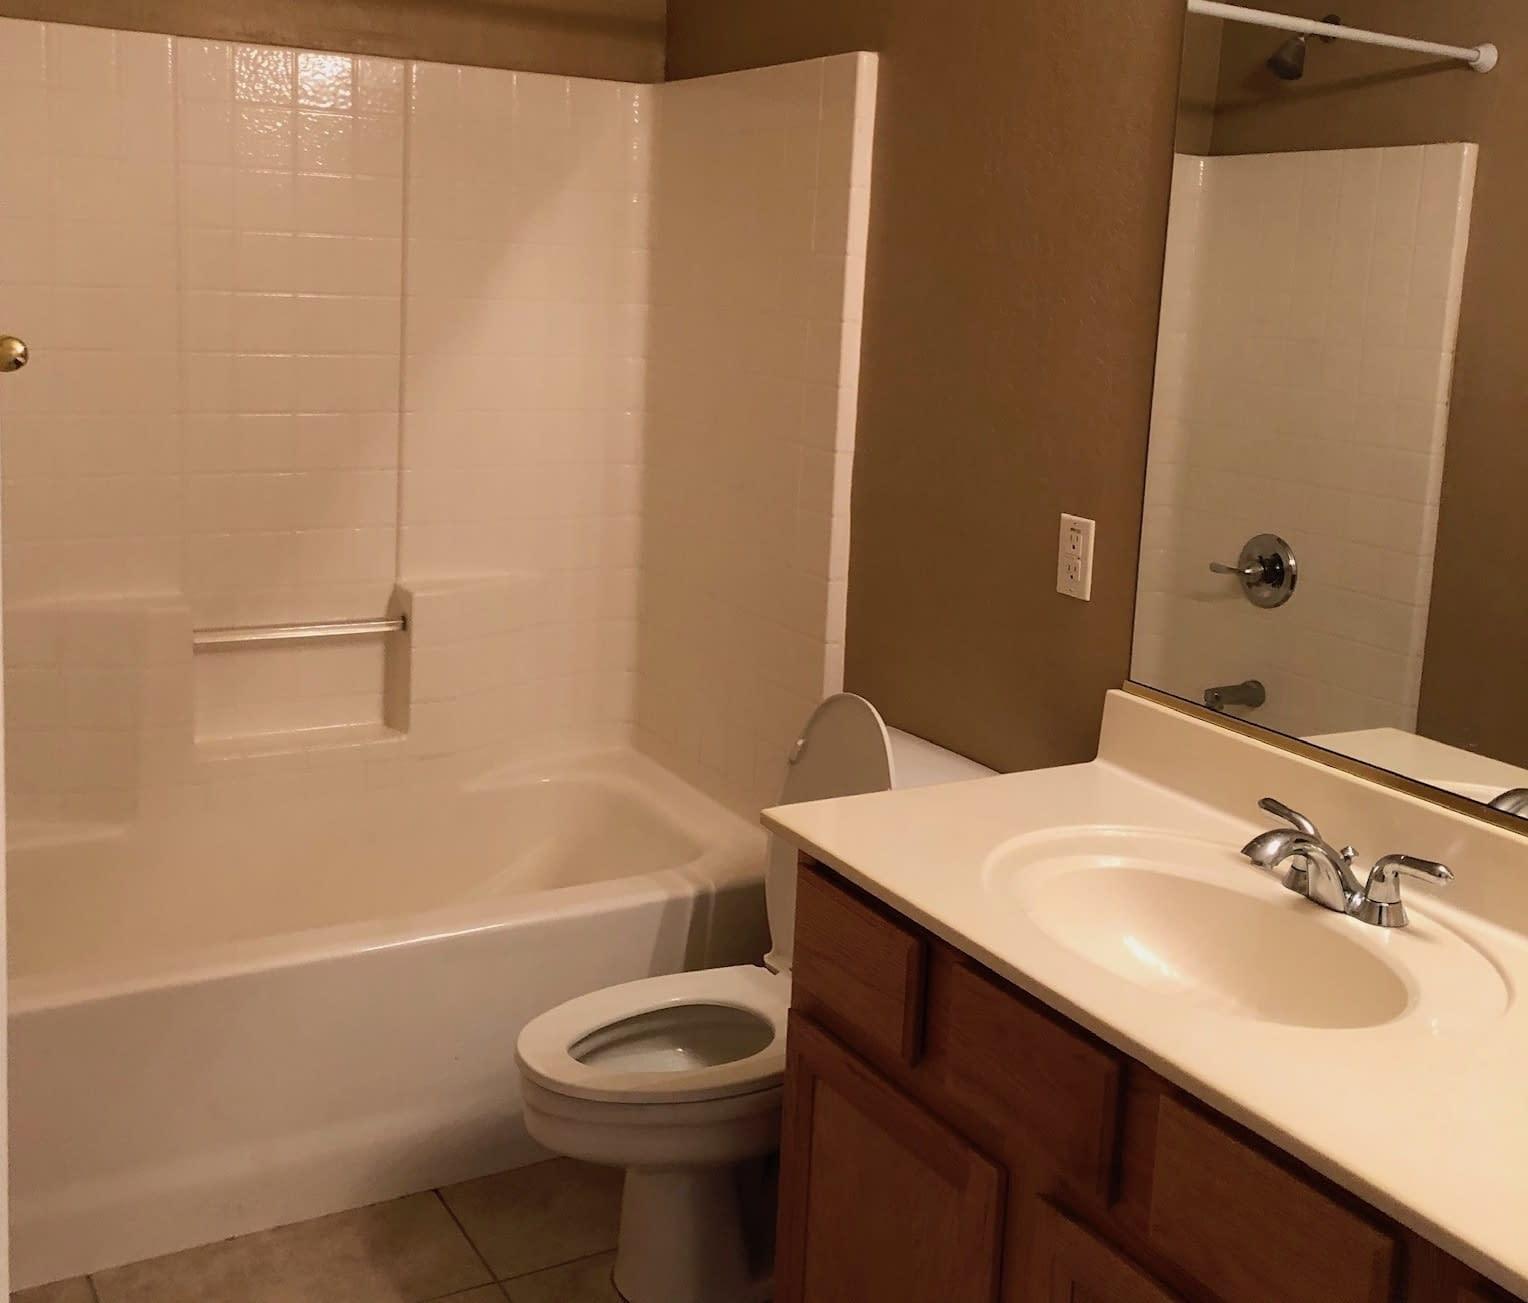 guest bathroom remodel Chandler before